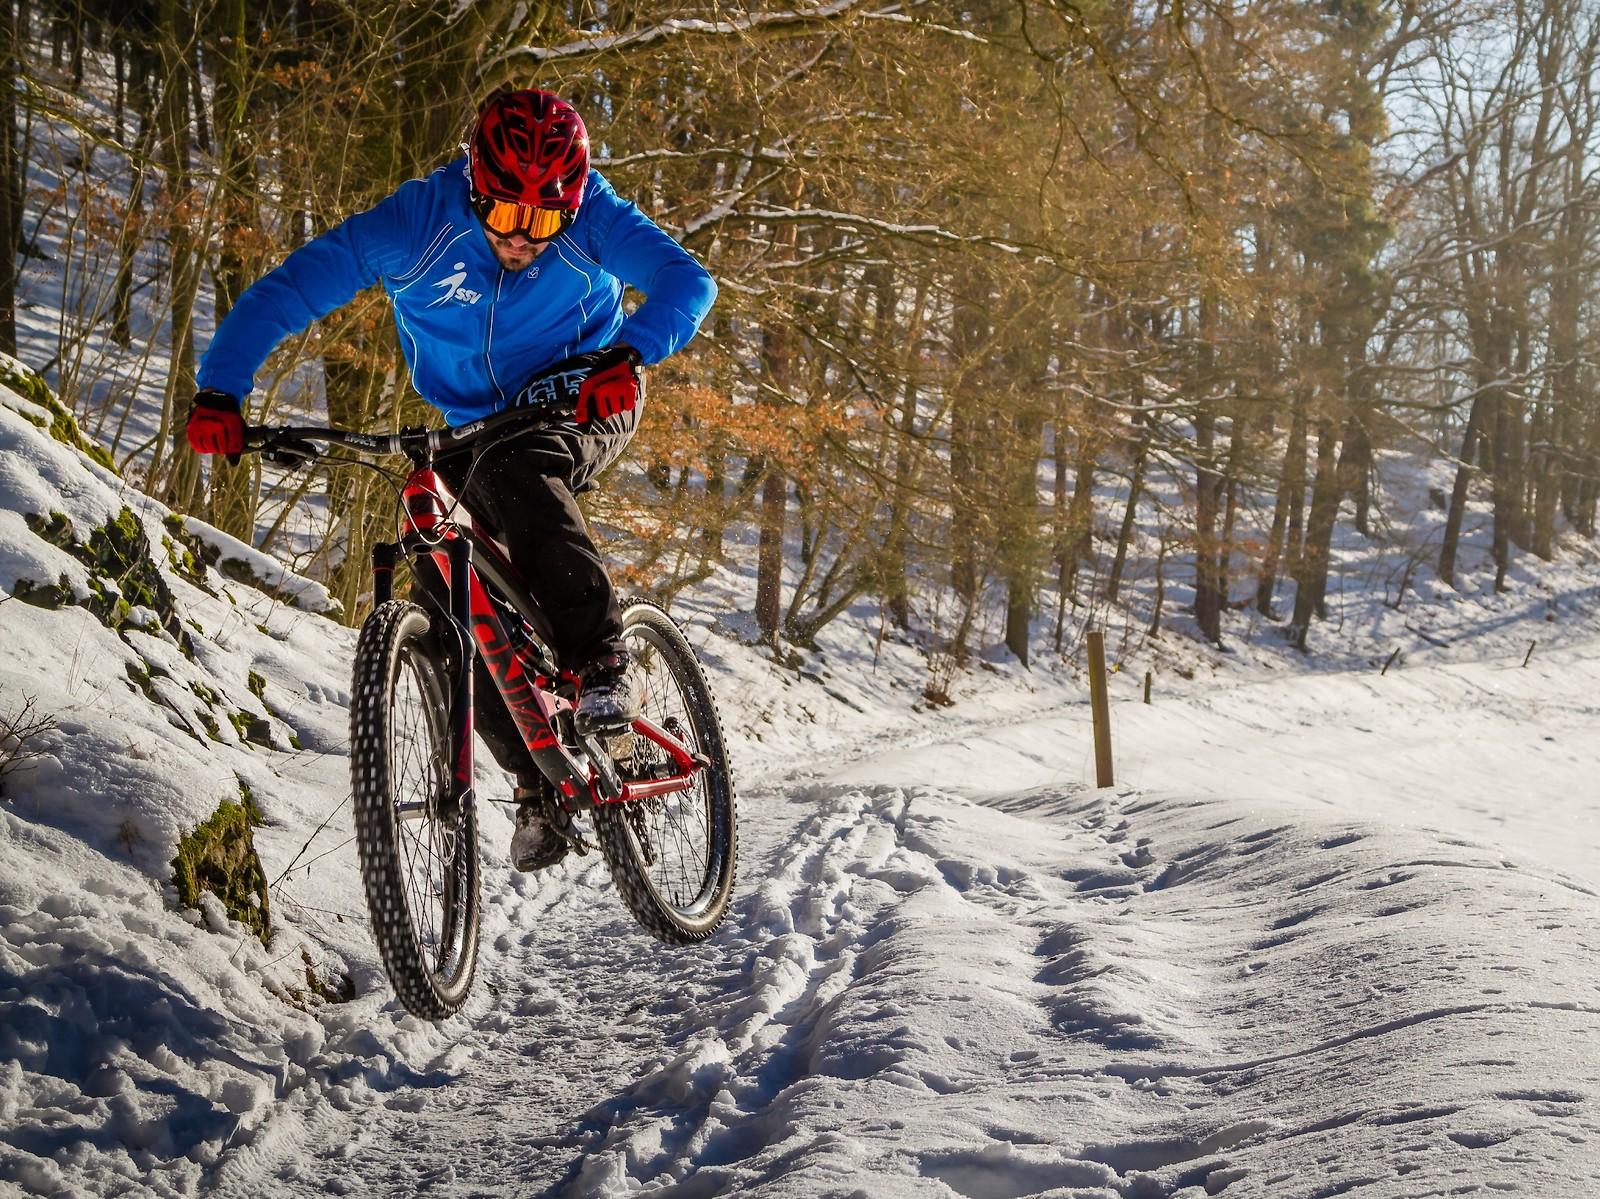 20171116 115610 - tomflemmig - Mountain Biking Pictures - Vital MTB